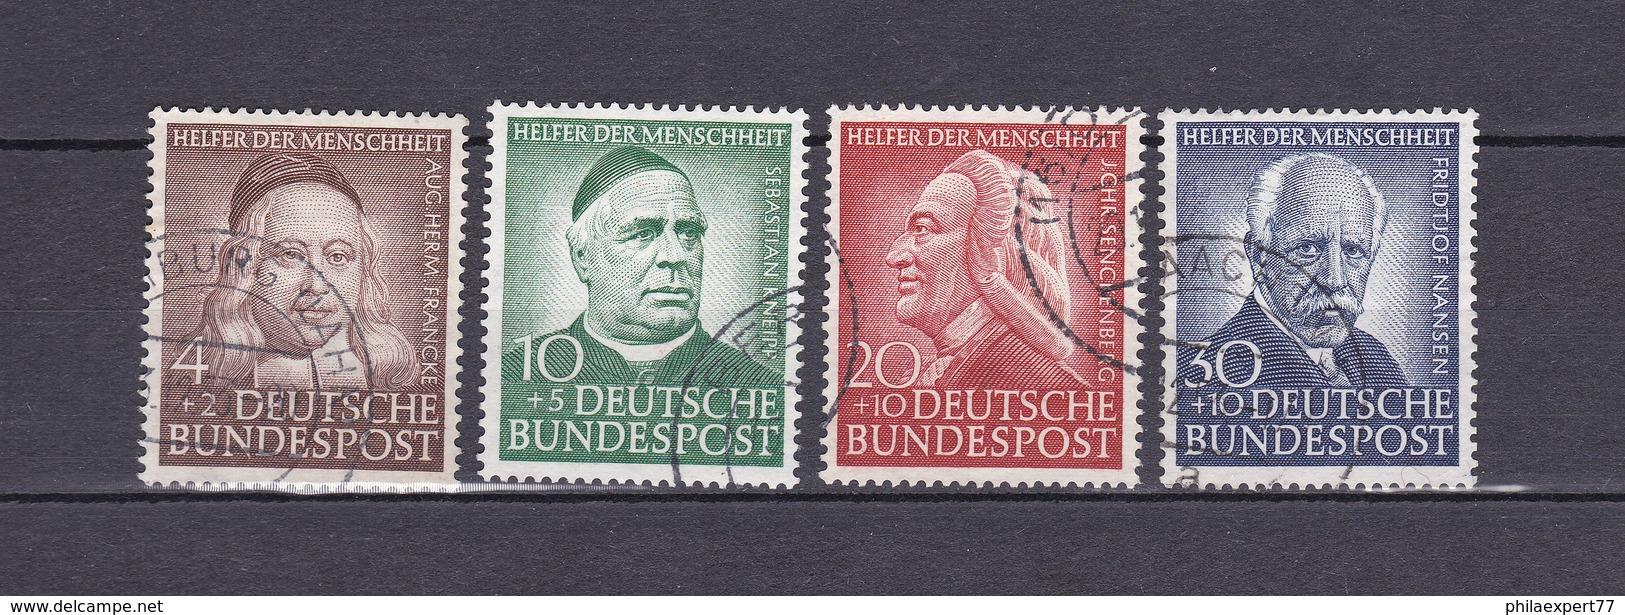 BRD - 1953 - Michel Nr. 173/176 - Gest. - 100 Euro - BRD